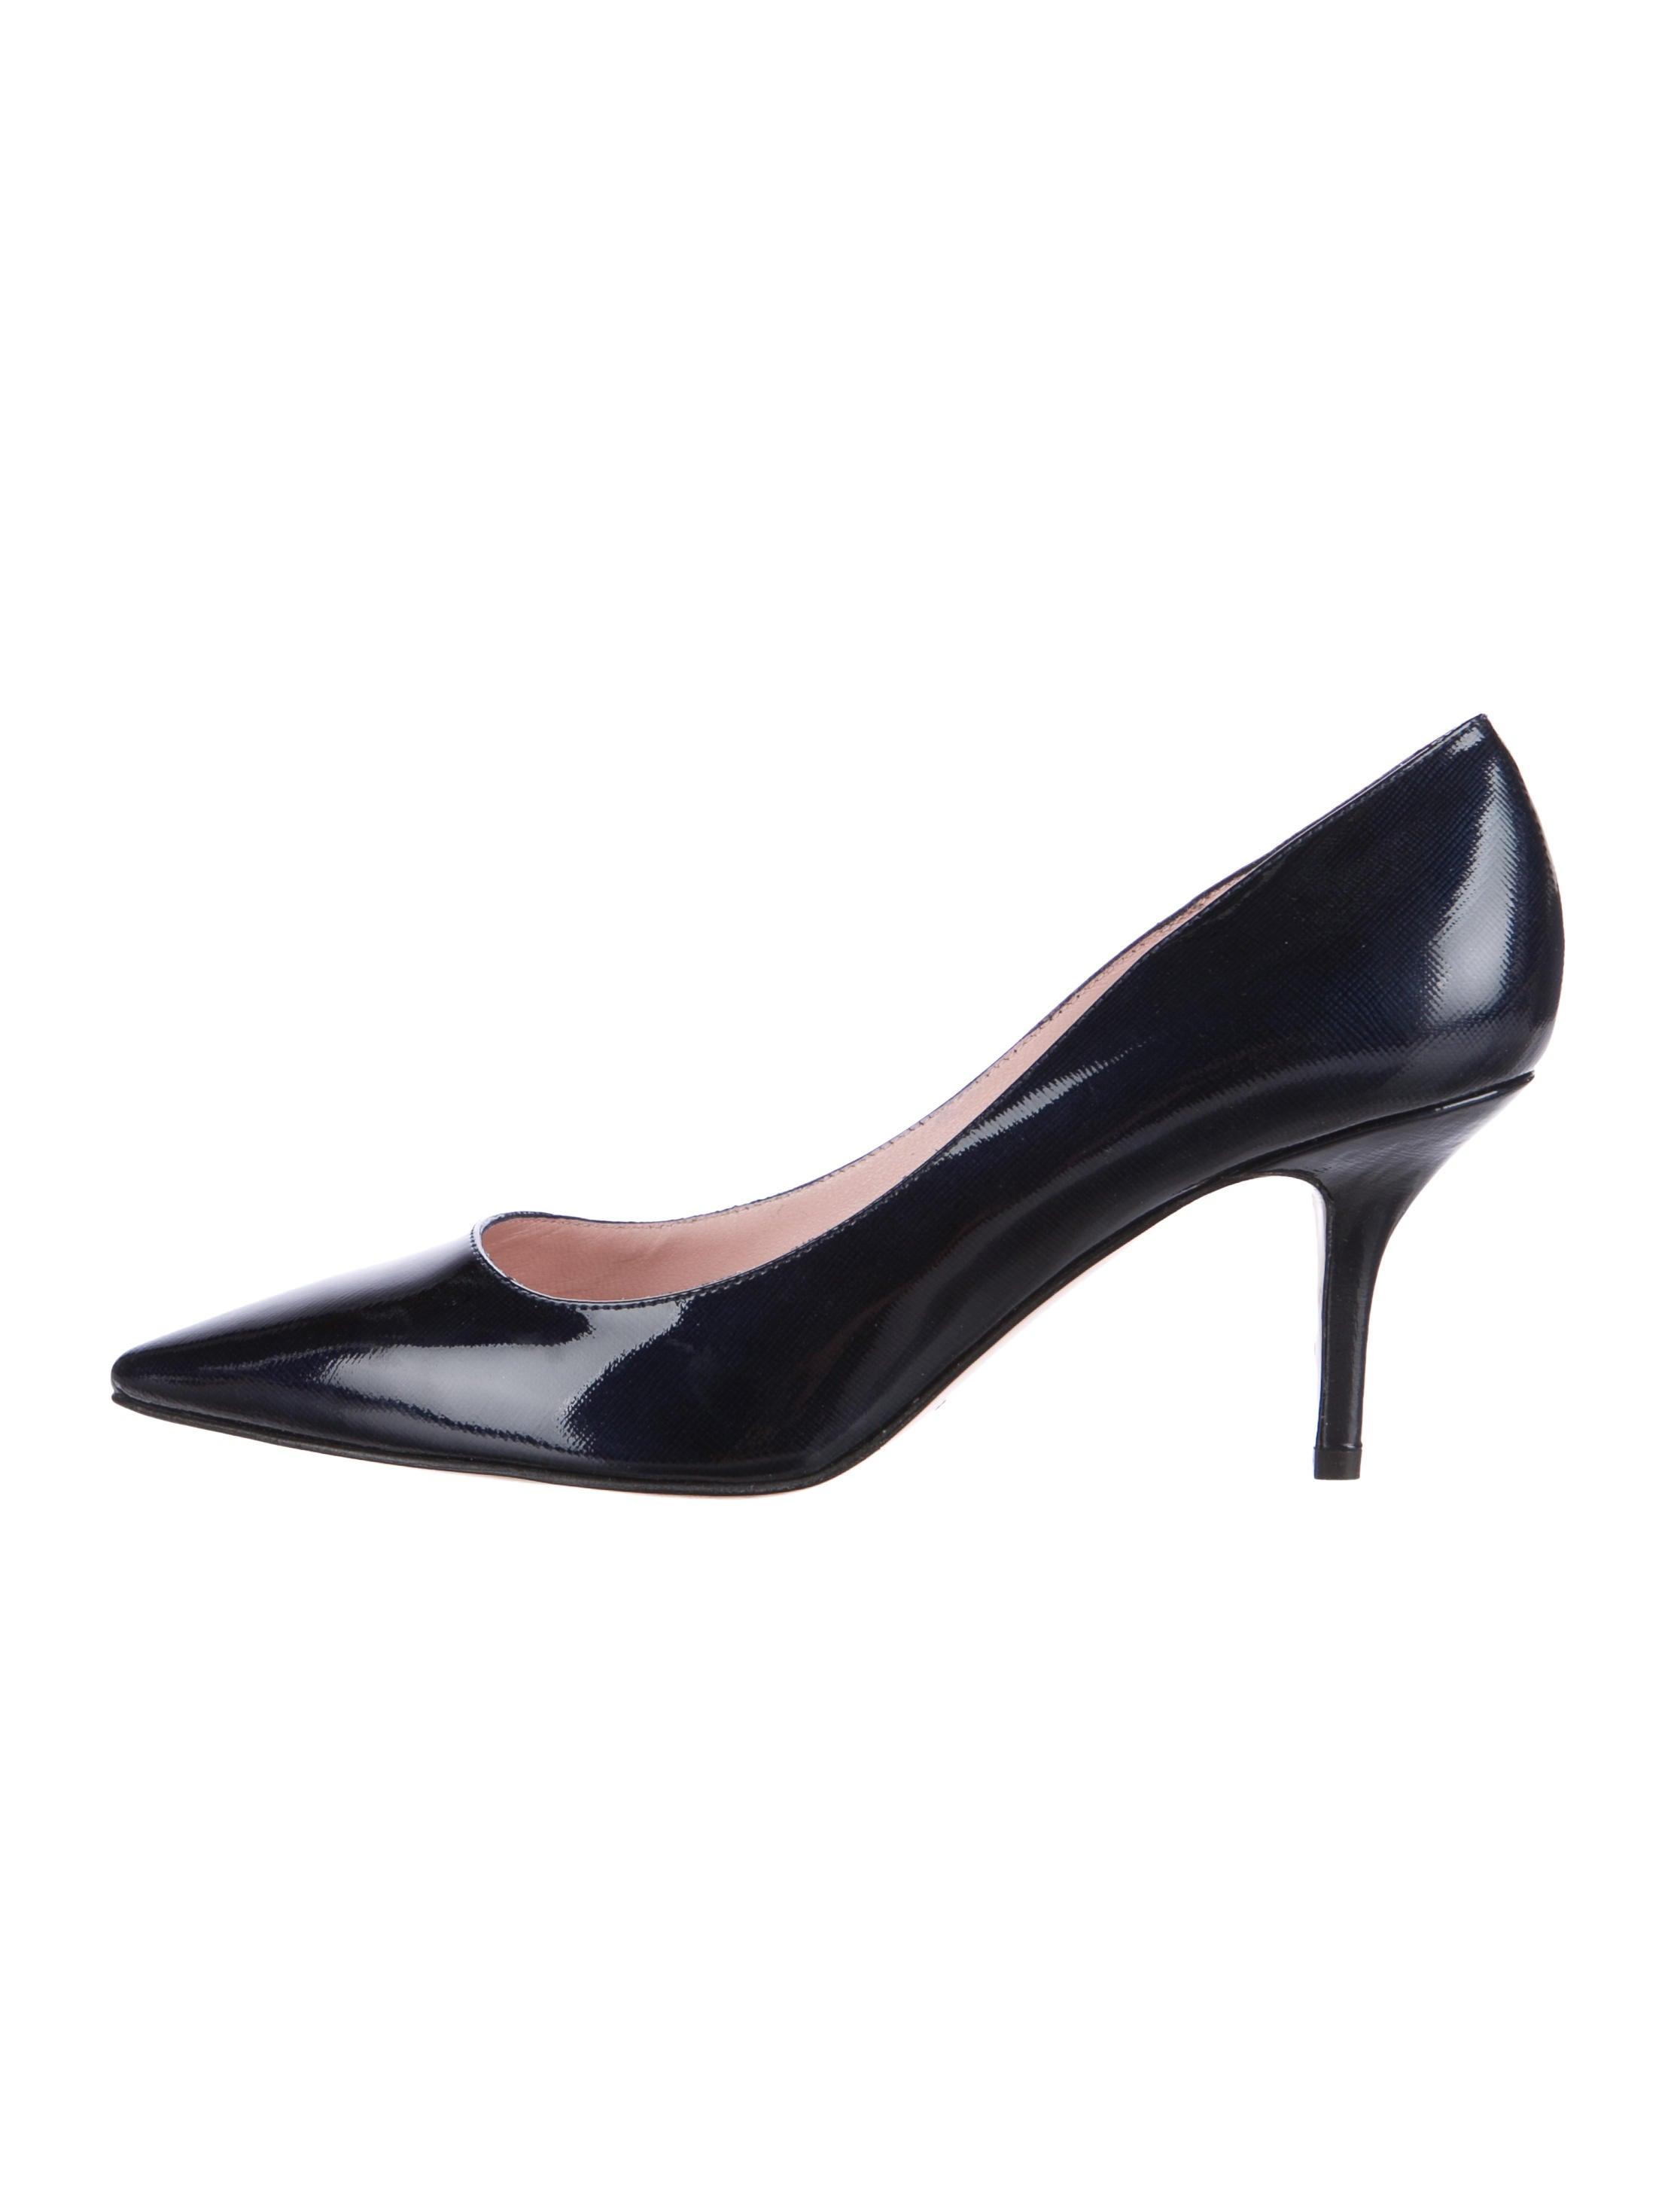 ead9128b4da0 Kate Spade New York Jessa Patent Leather Pumps w  Tags - Shoes ...